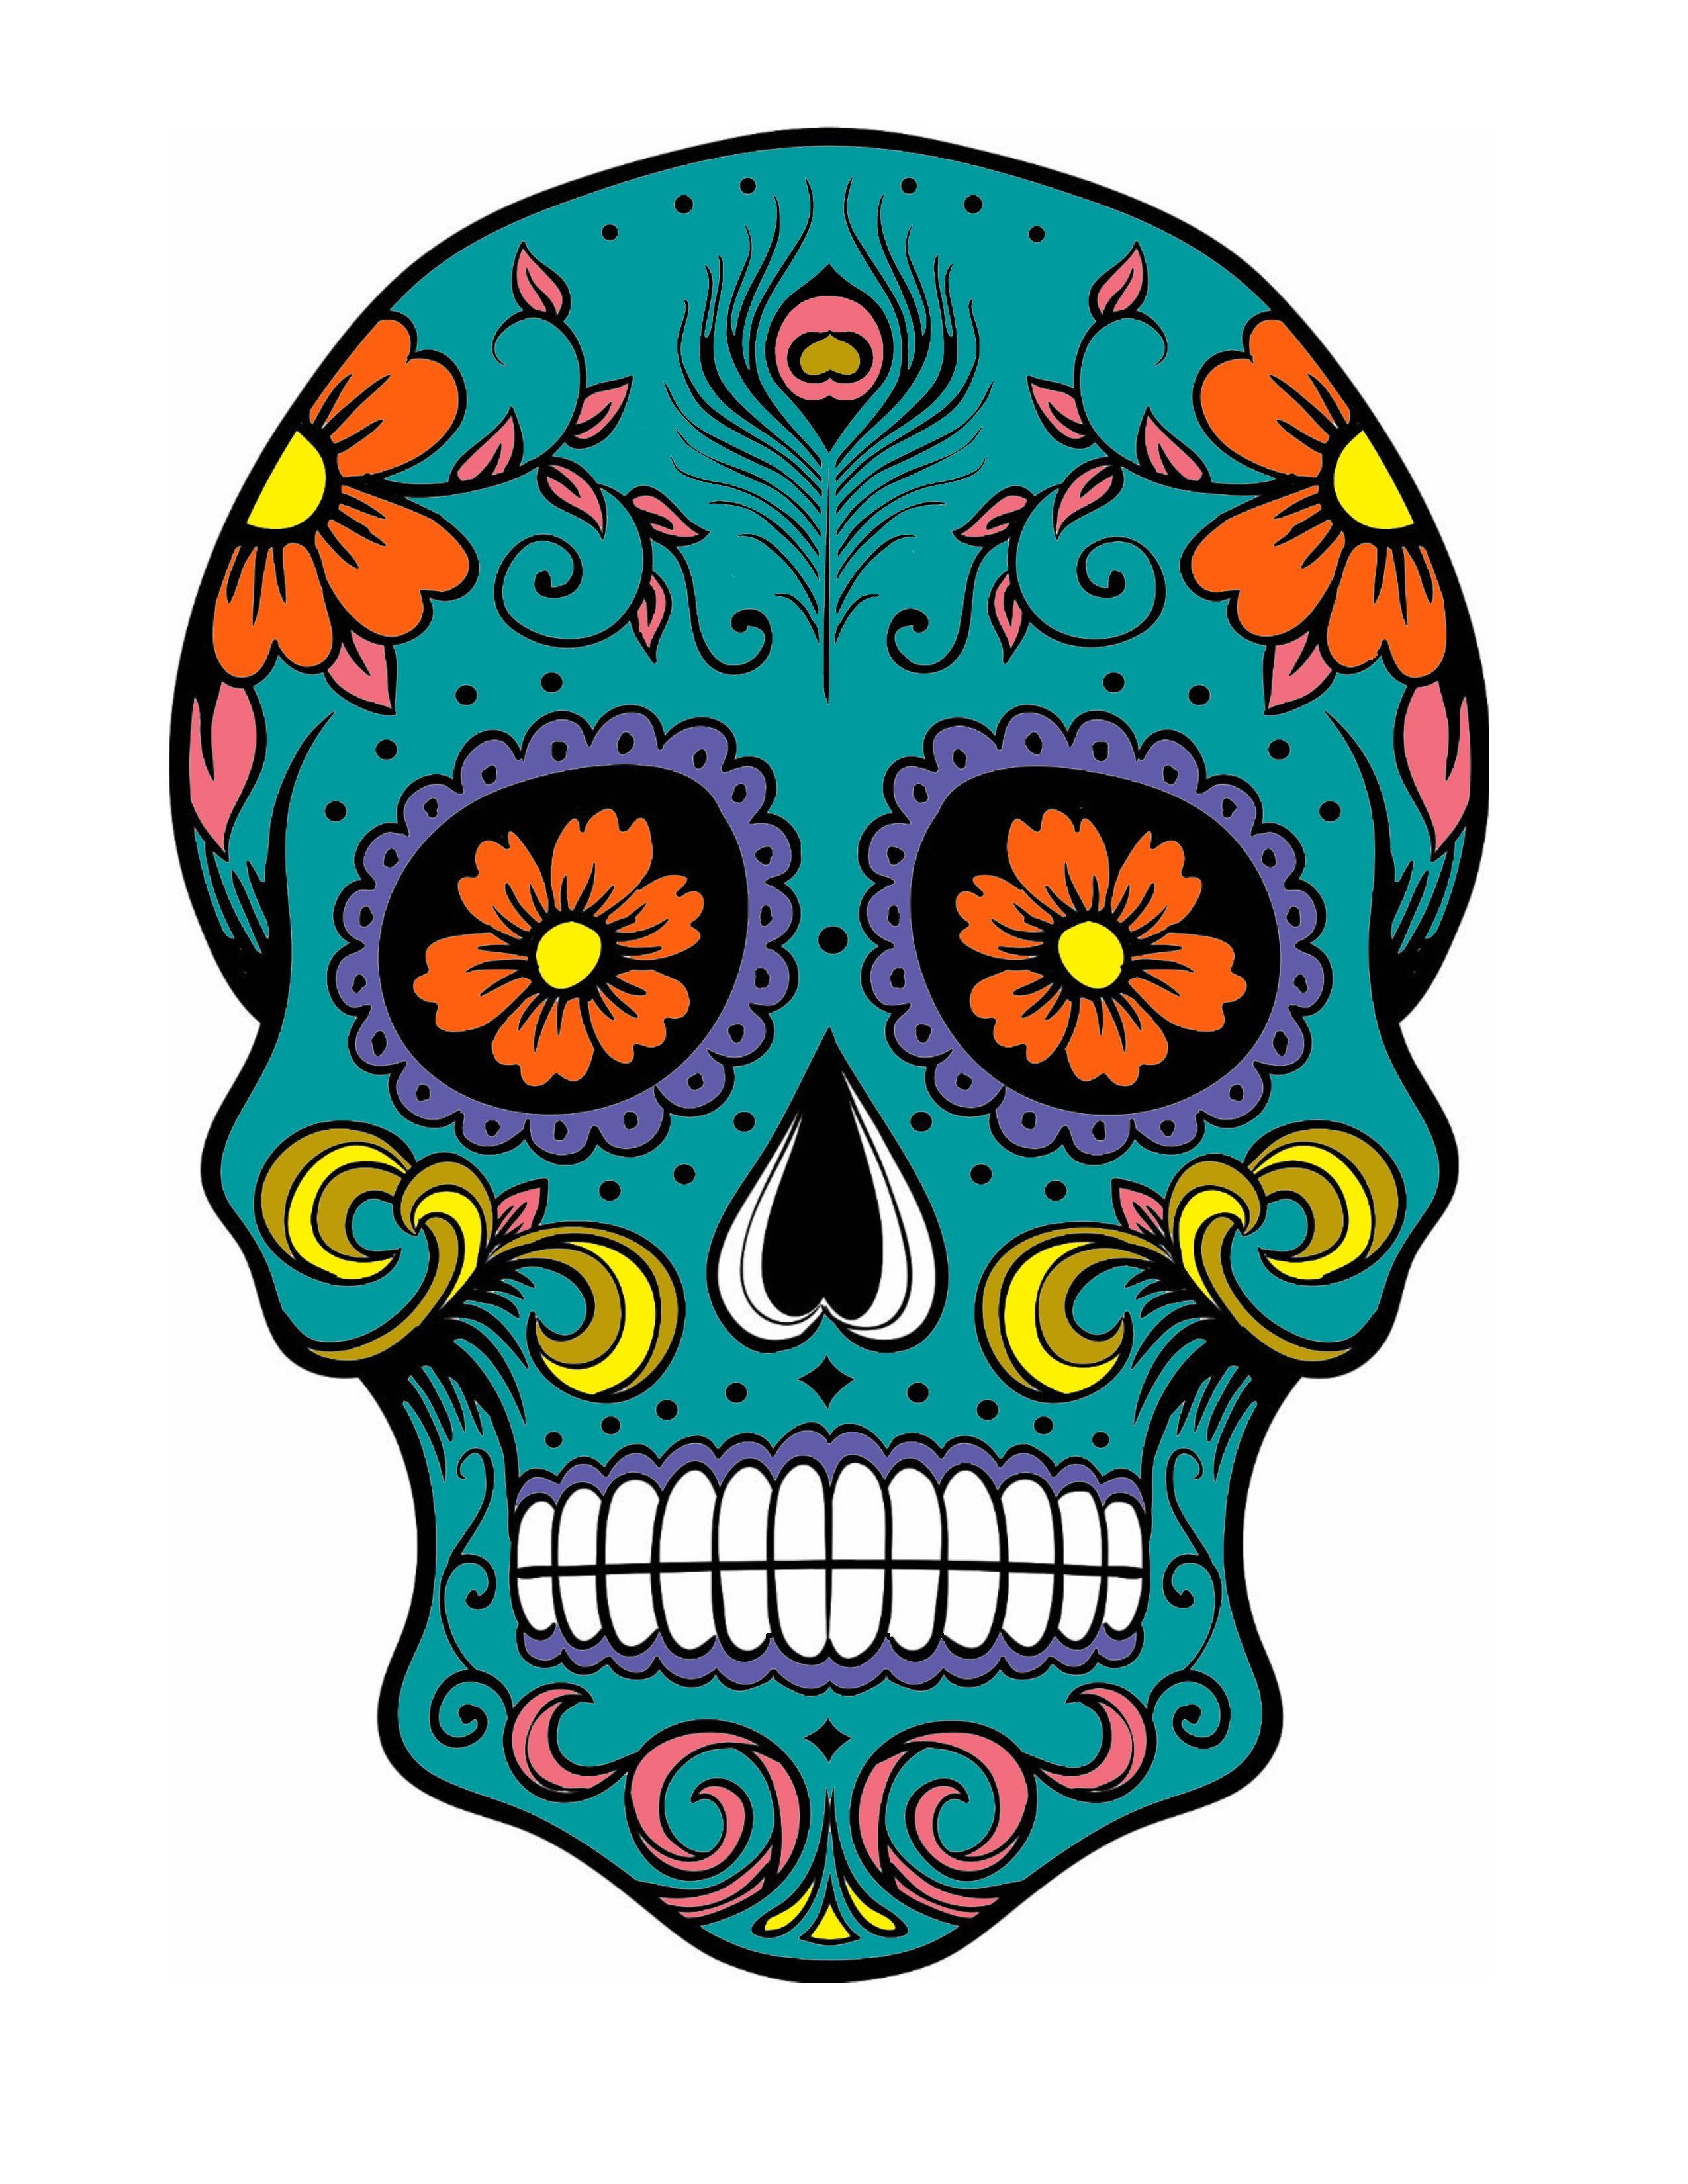 Classified Ads Software Website Templates - Joomla-Monster Dia de los muertos sugar skull pictures